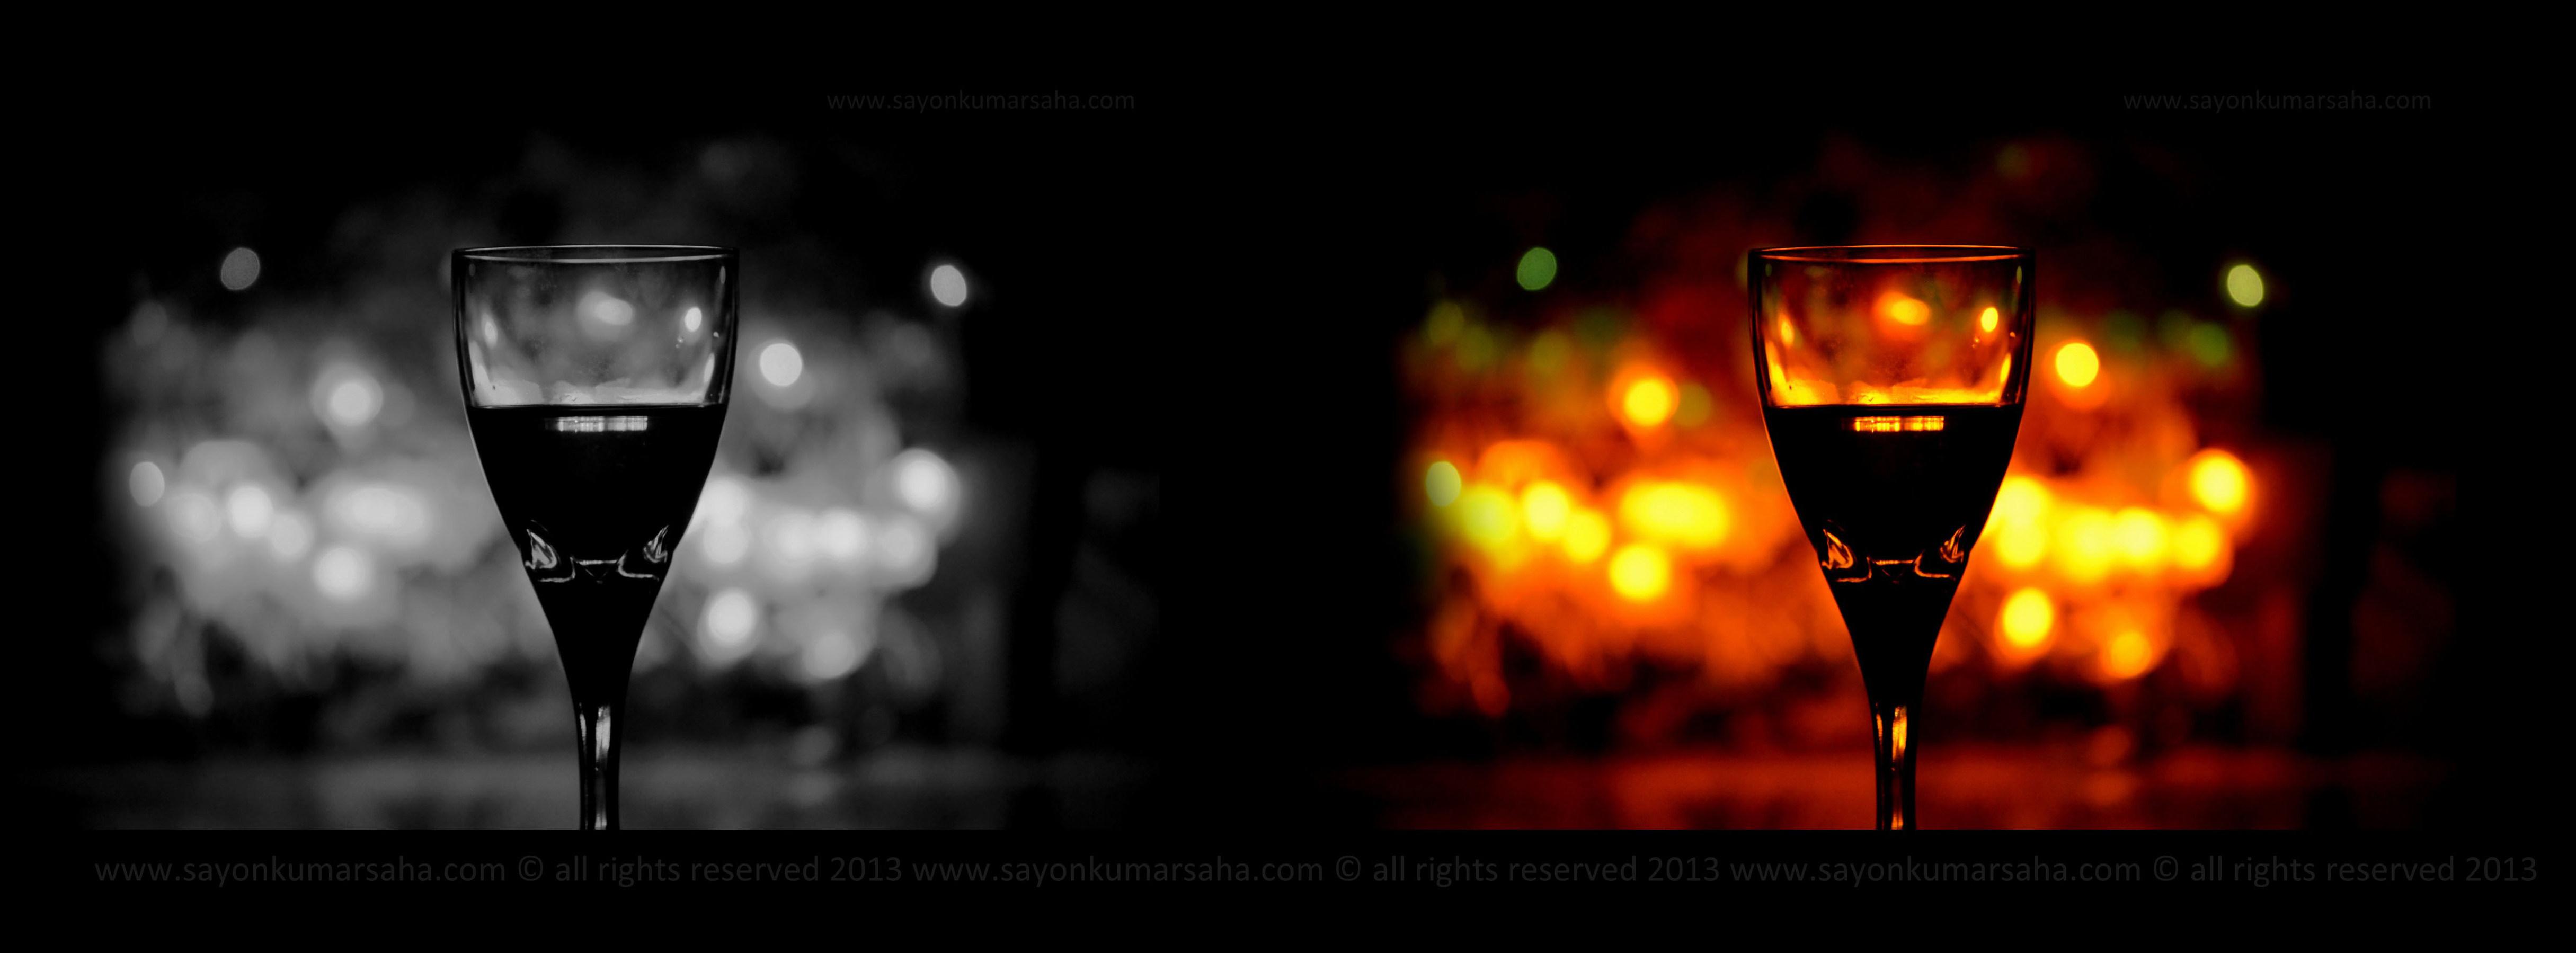 sayonkumarsahaphotography-1